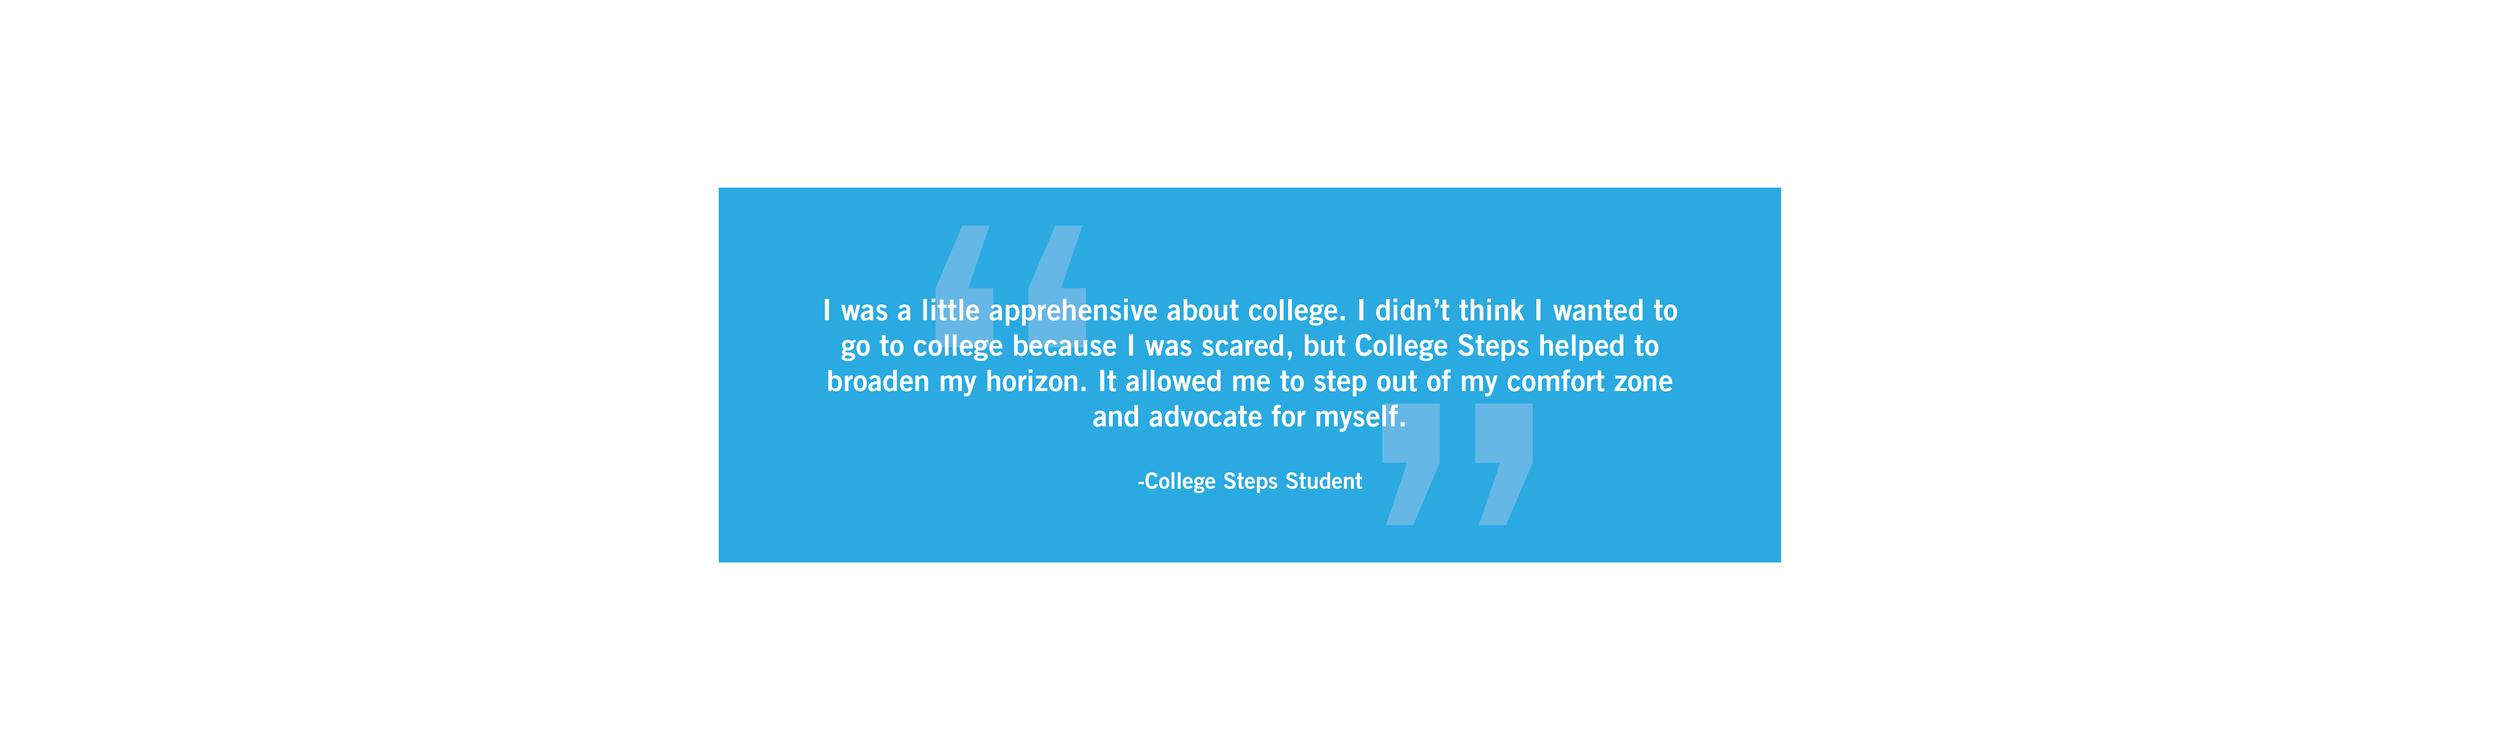 College Steps slider testimonials2-02.png